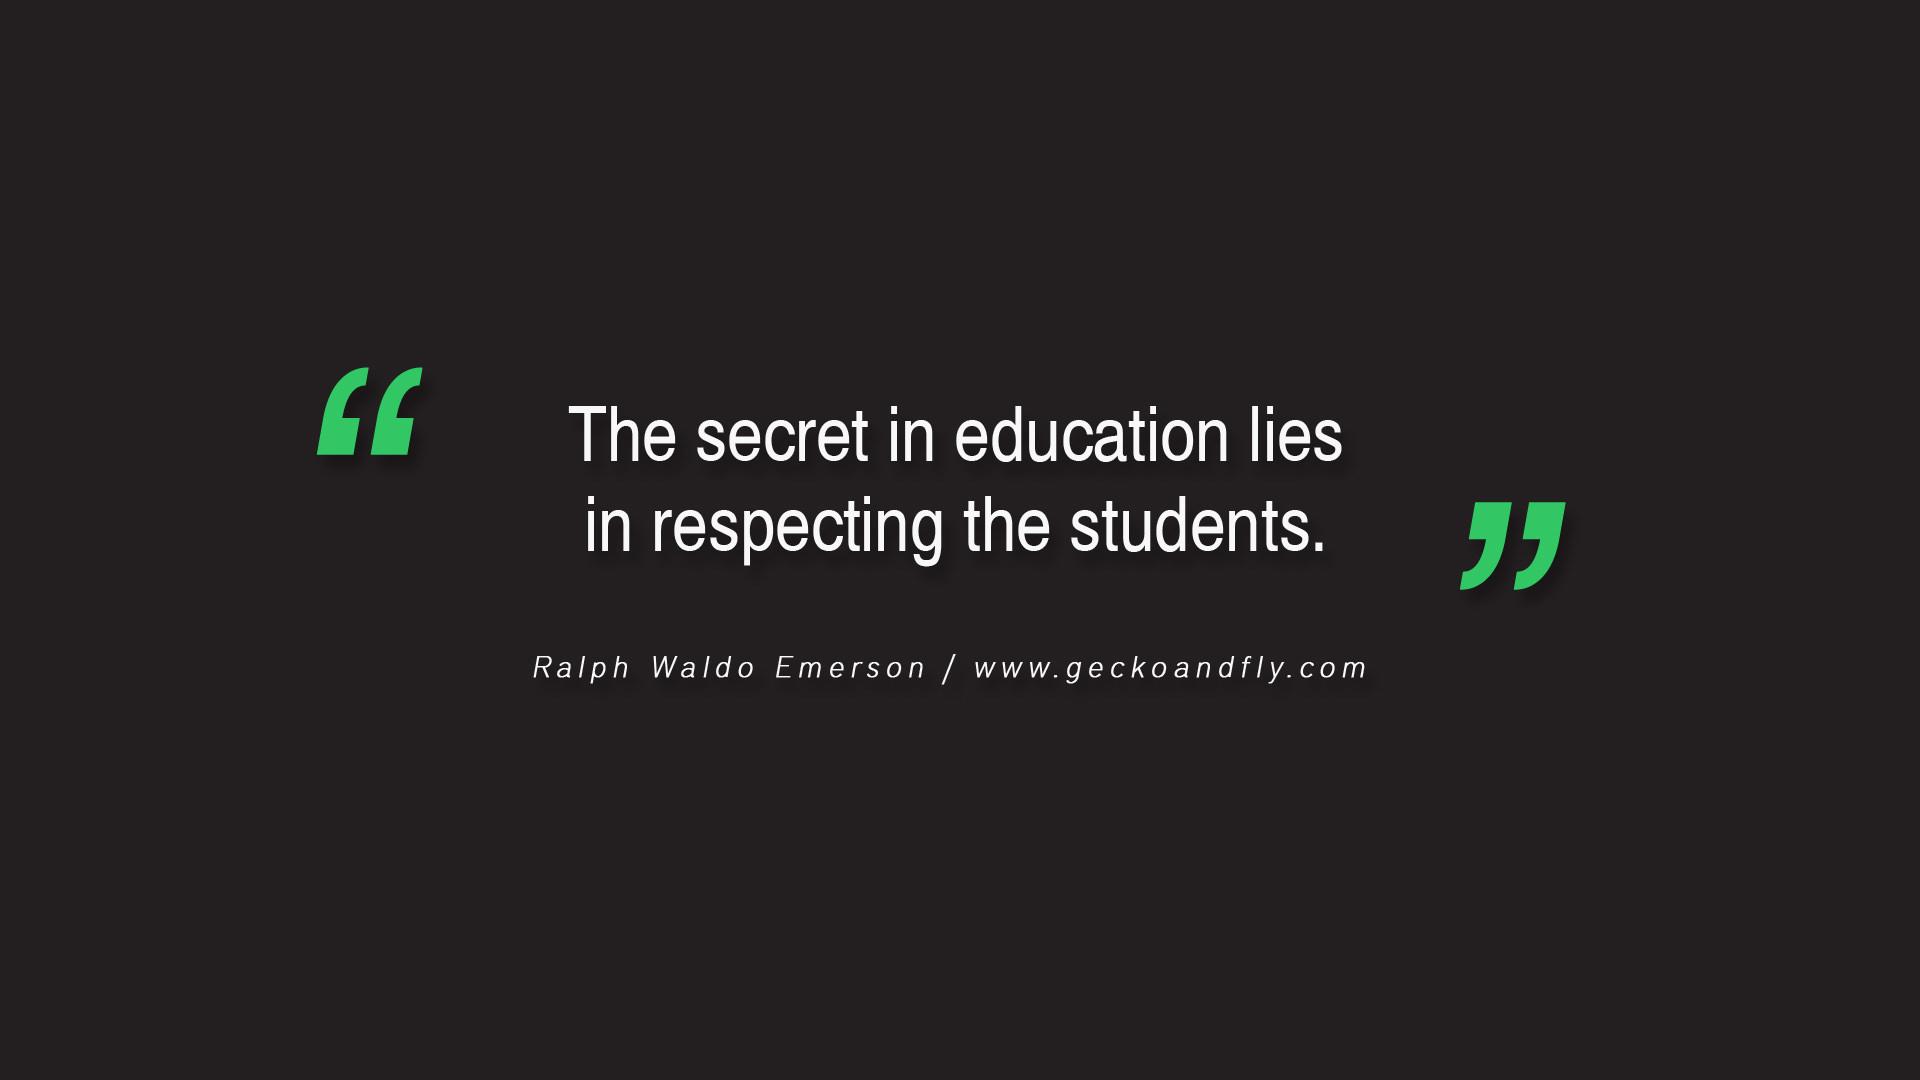 Ralph Waldo Emerson Education Quotes. QuotesGram